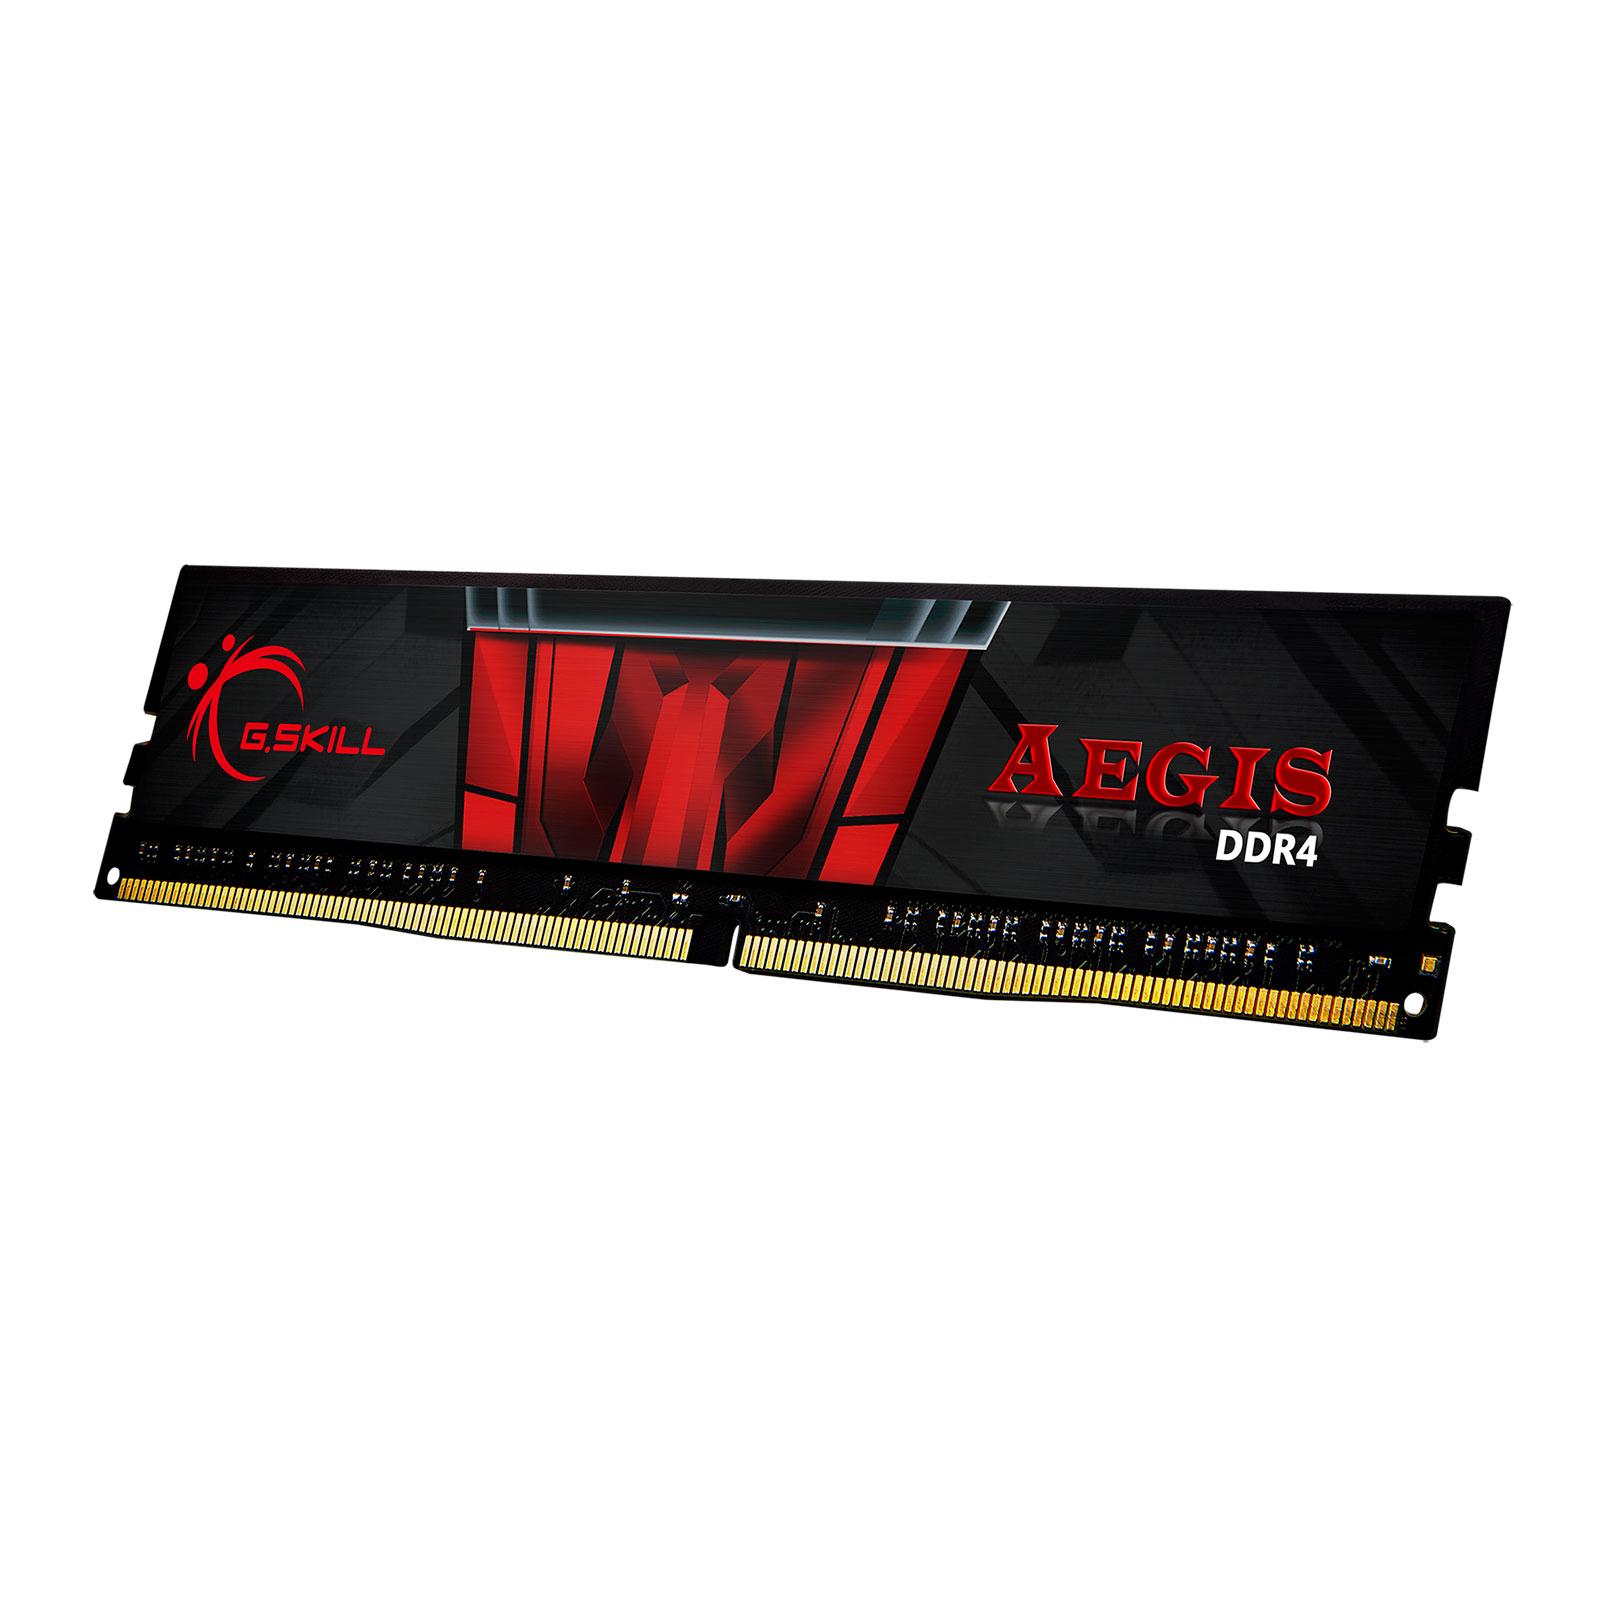 Mémoire PC G.Skill Aegis 16 Go (1 x 16 Go) DDR4 3000 MHz CL16 RAM DDR4 PC4-24000 - F4-3000C16S-16GISB